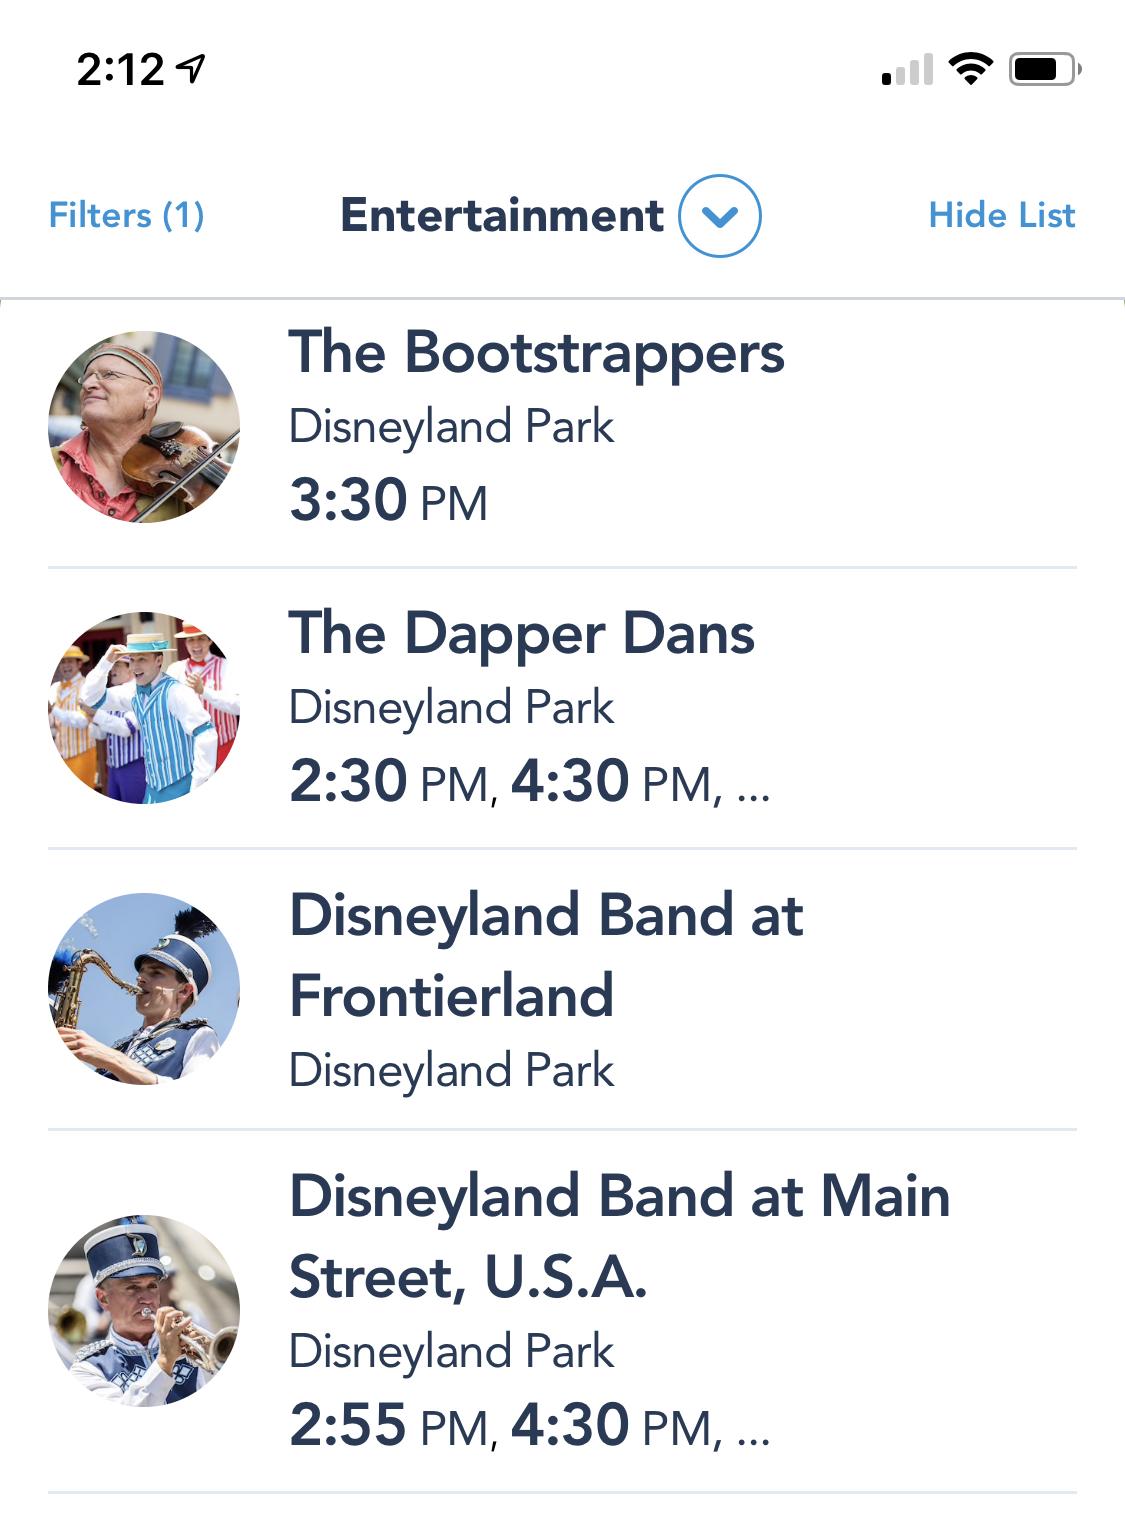 disneyland one day itinerary entertainment schedule.jpeg